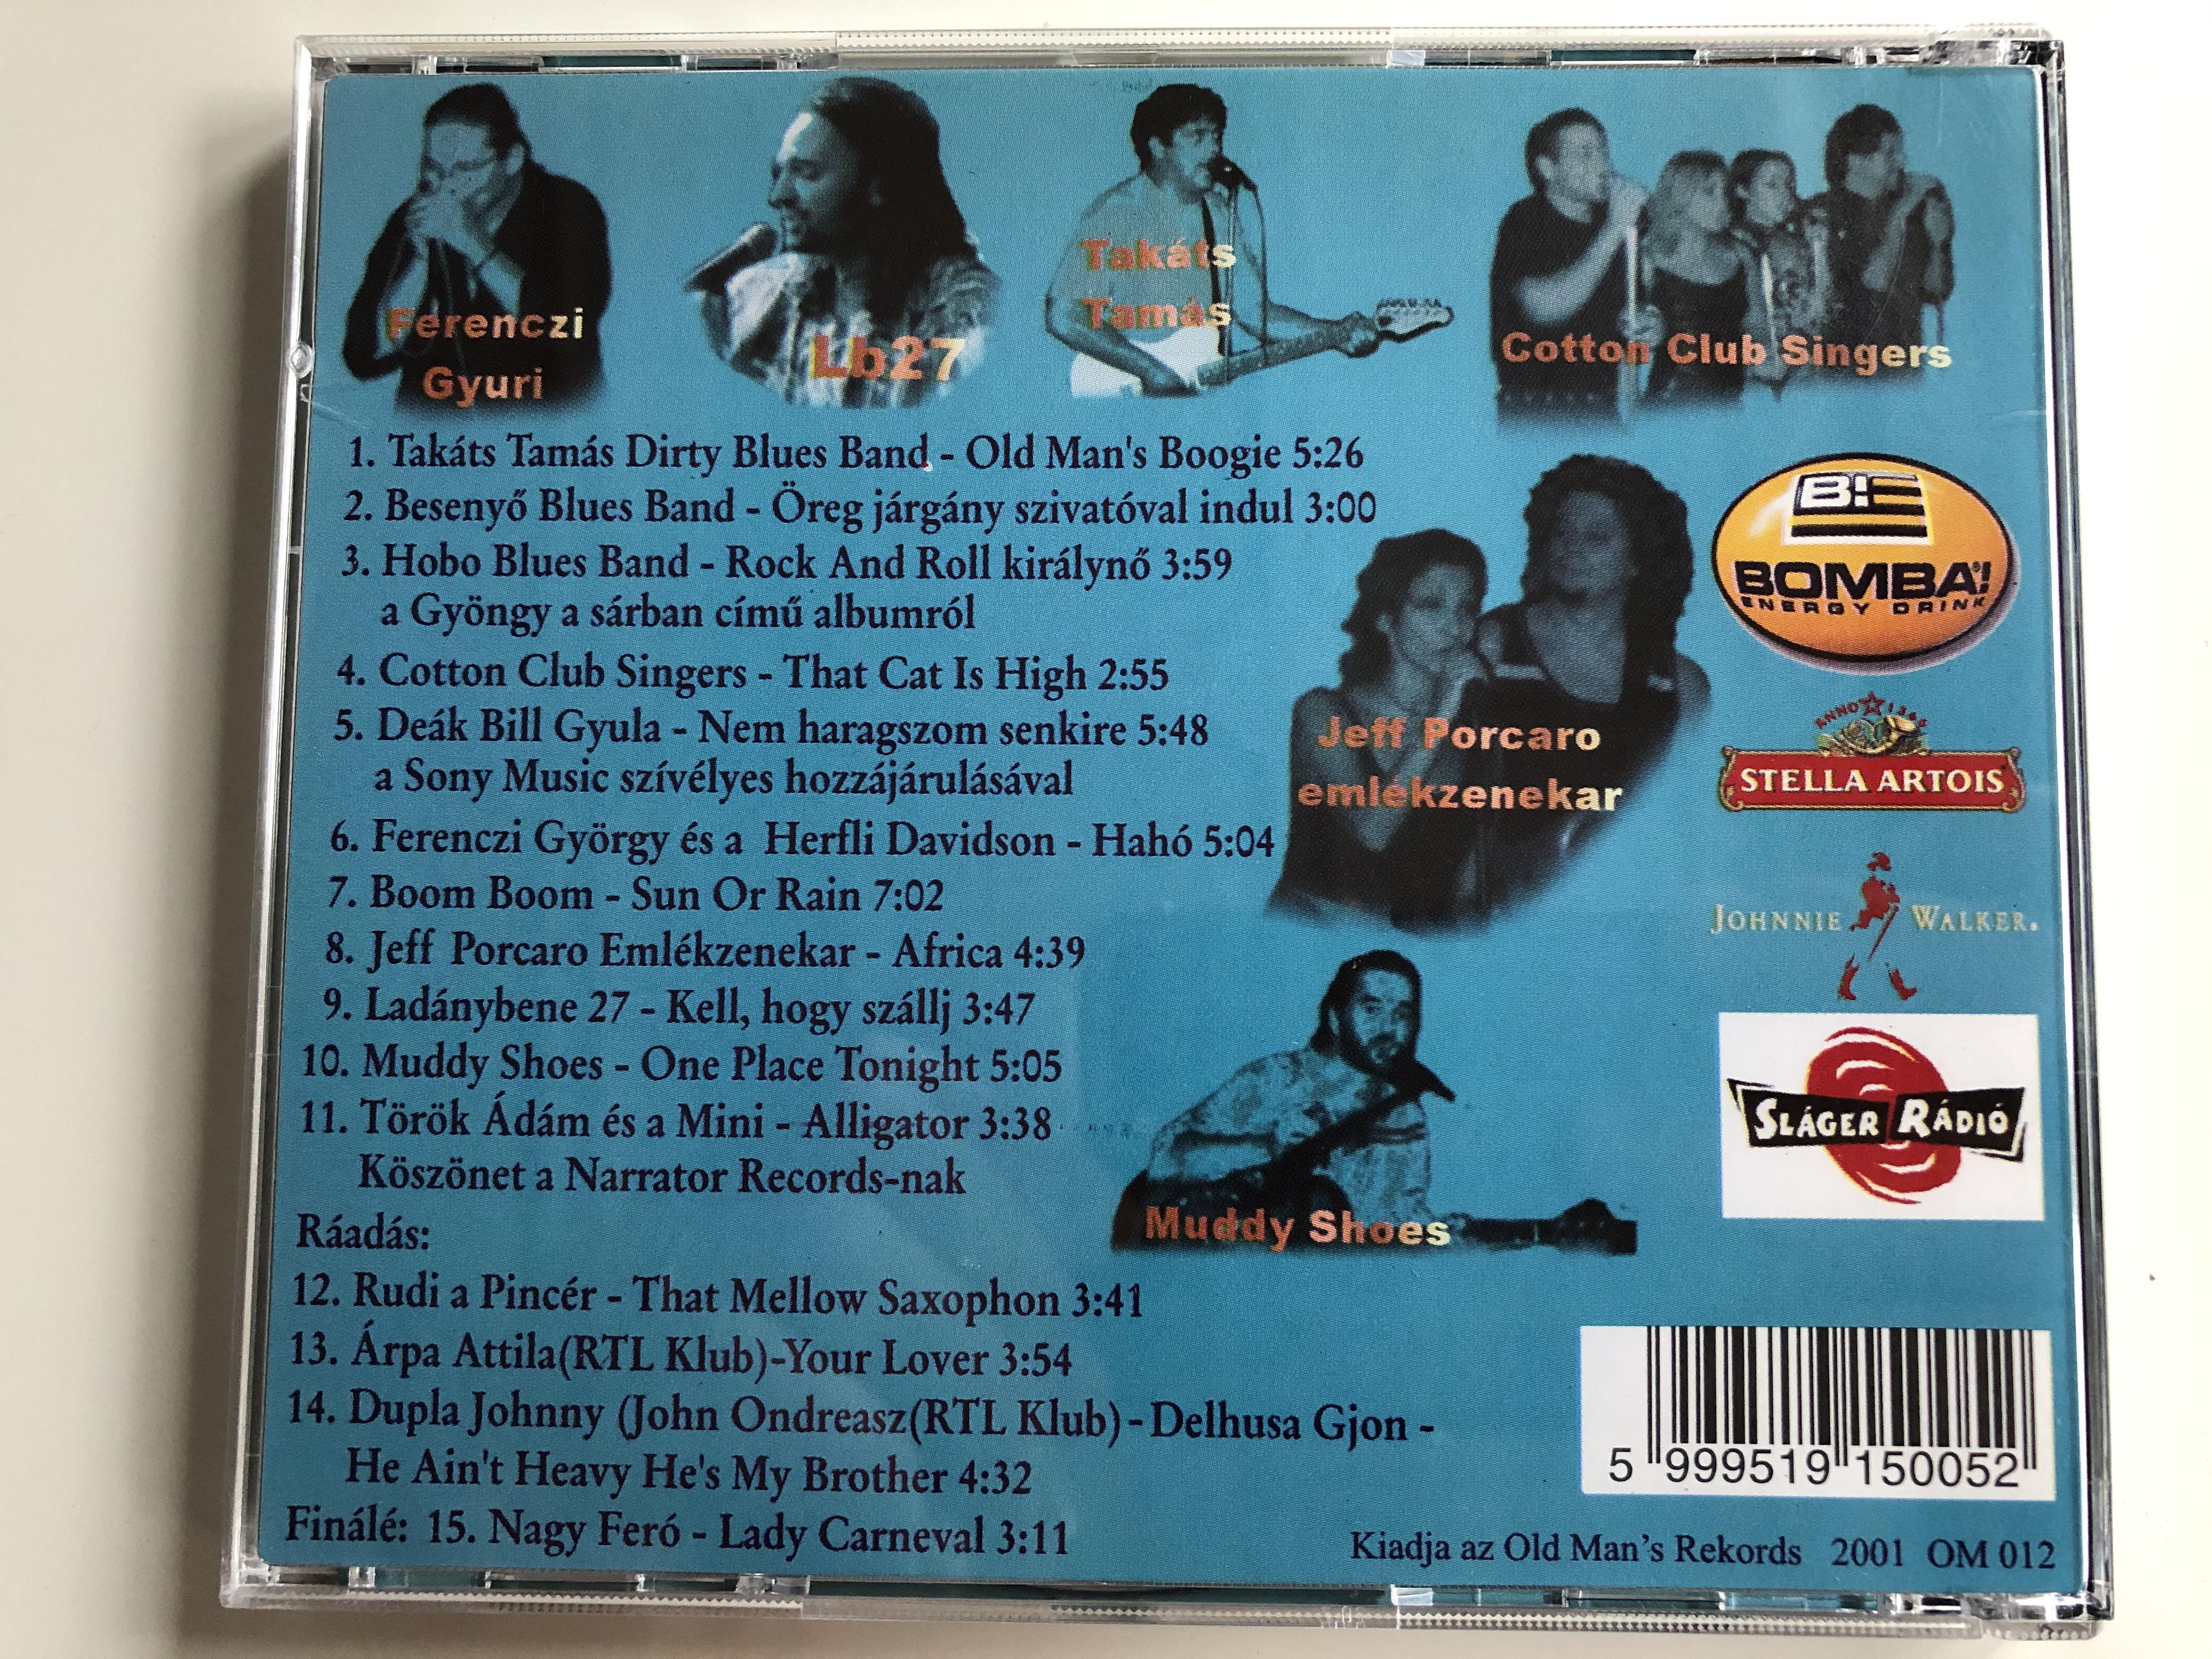 old-man-s-music-pub-budapest-all-star-s-songbook-2-tatrai-hebo-mucki-adi-fero-bill-old-man-s-records-audio-cd-2001-om-012-7-.jpg